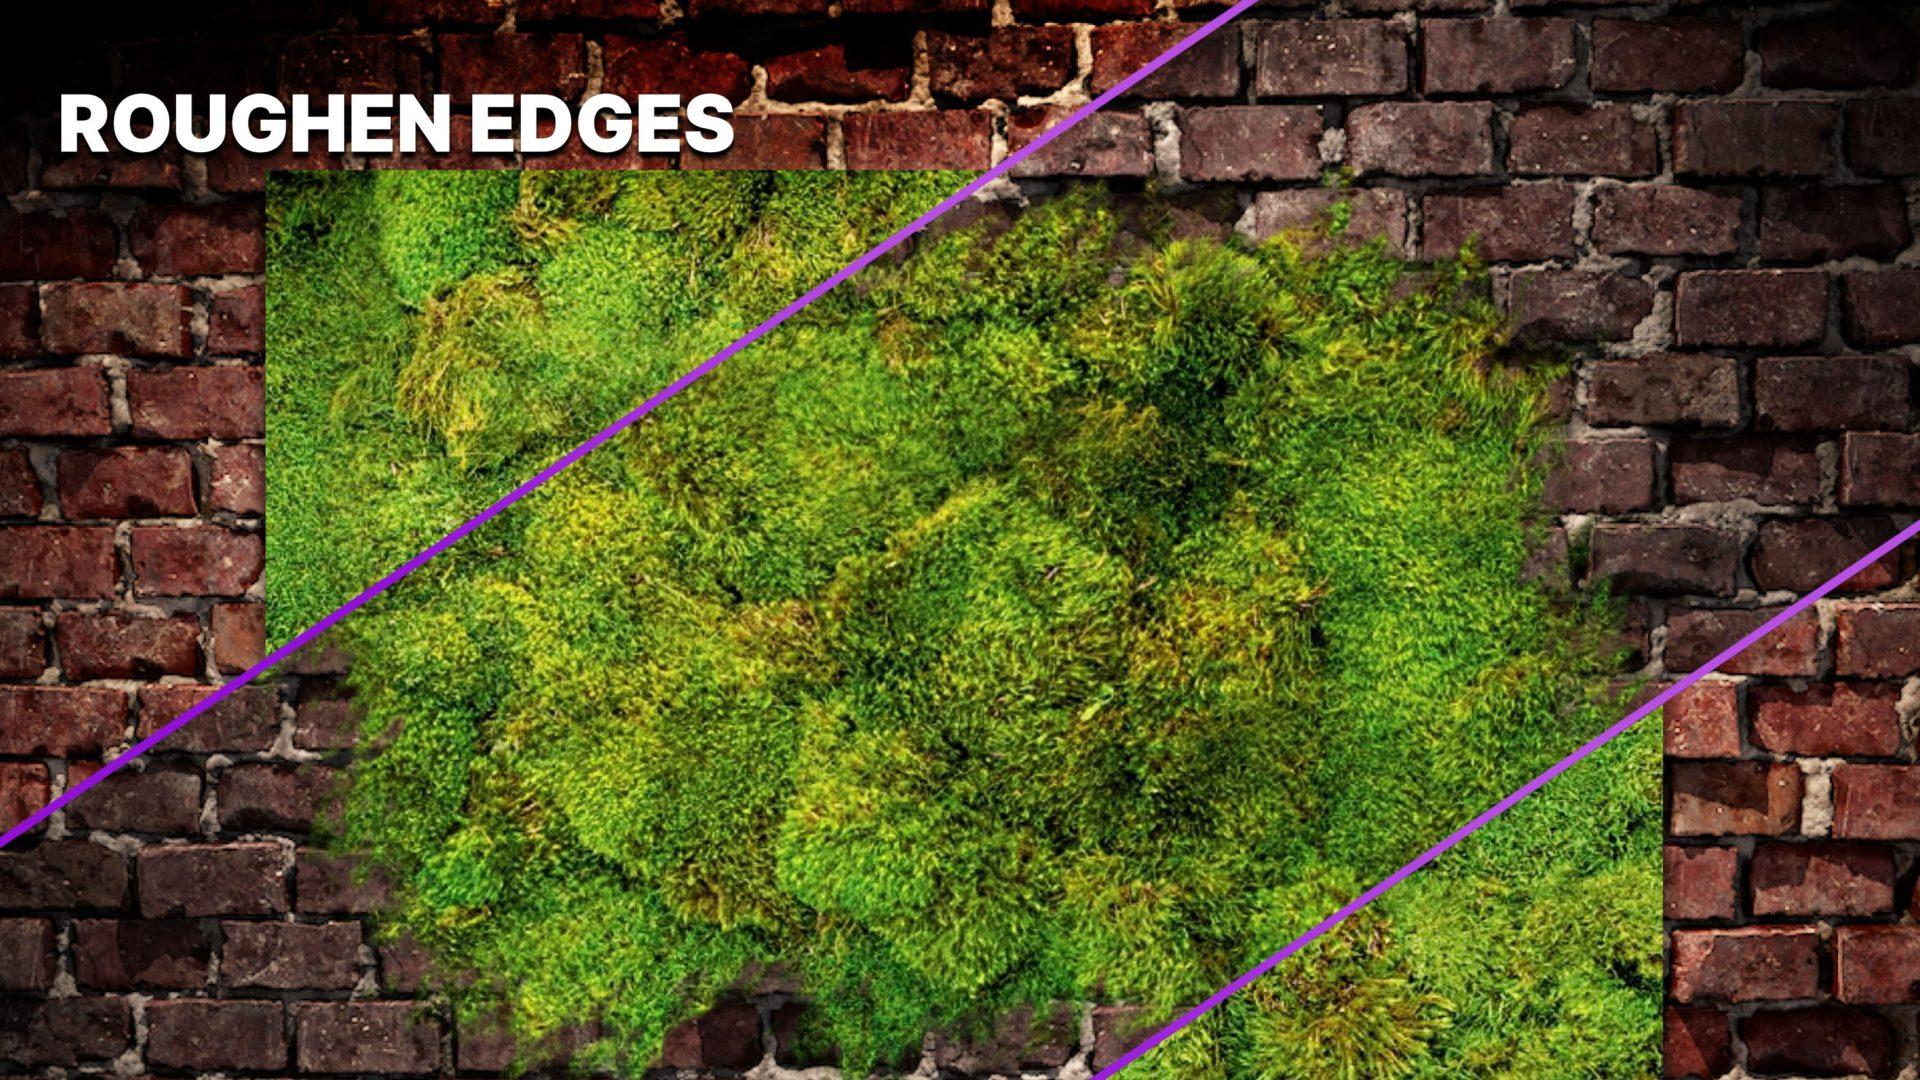 Roughen edges effect in Imerge 2021.3